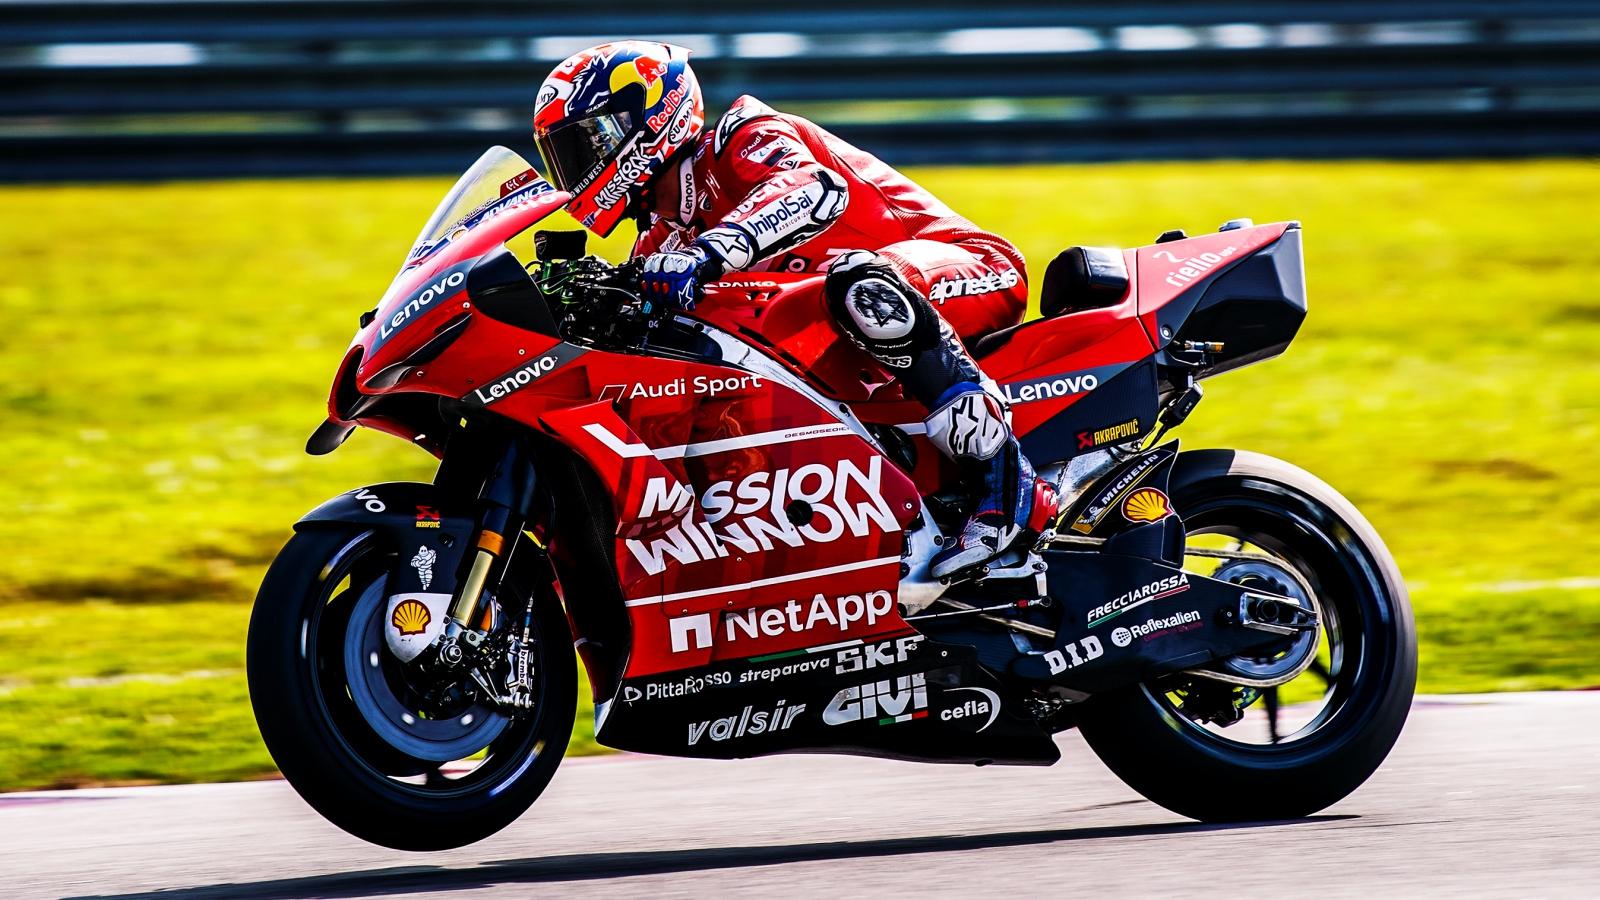 MotoGP 2019: Ducati sigue firme, Yamaha asoma, Honda se oculta y Suzuki se tapa